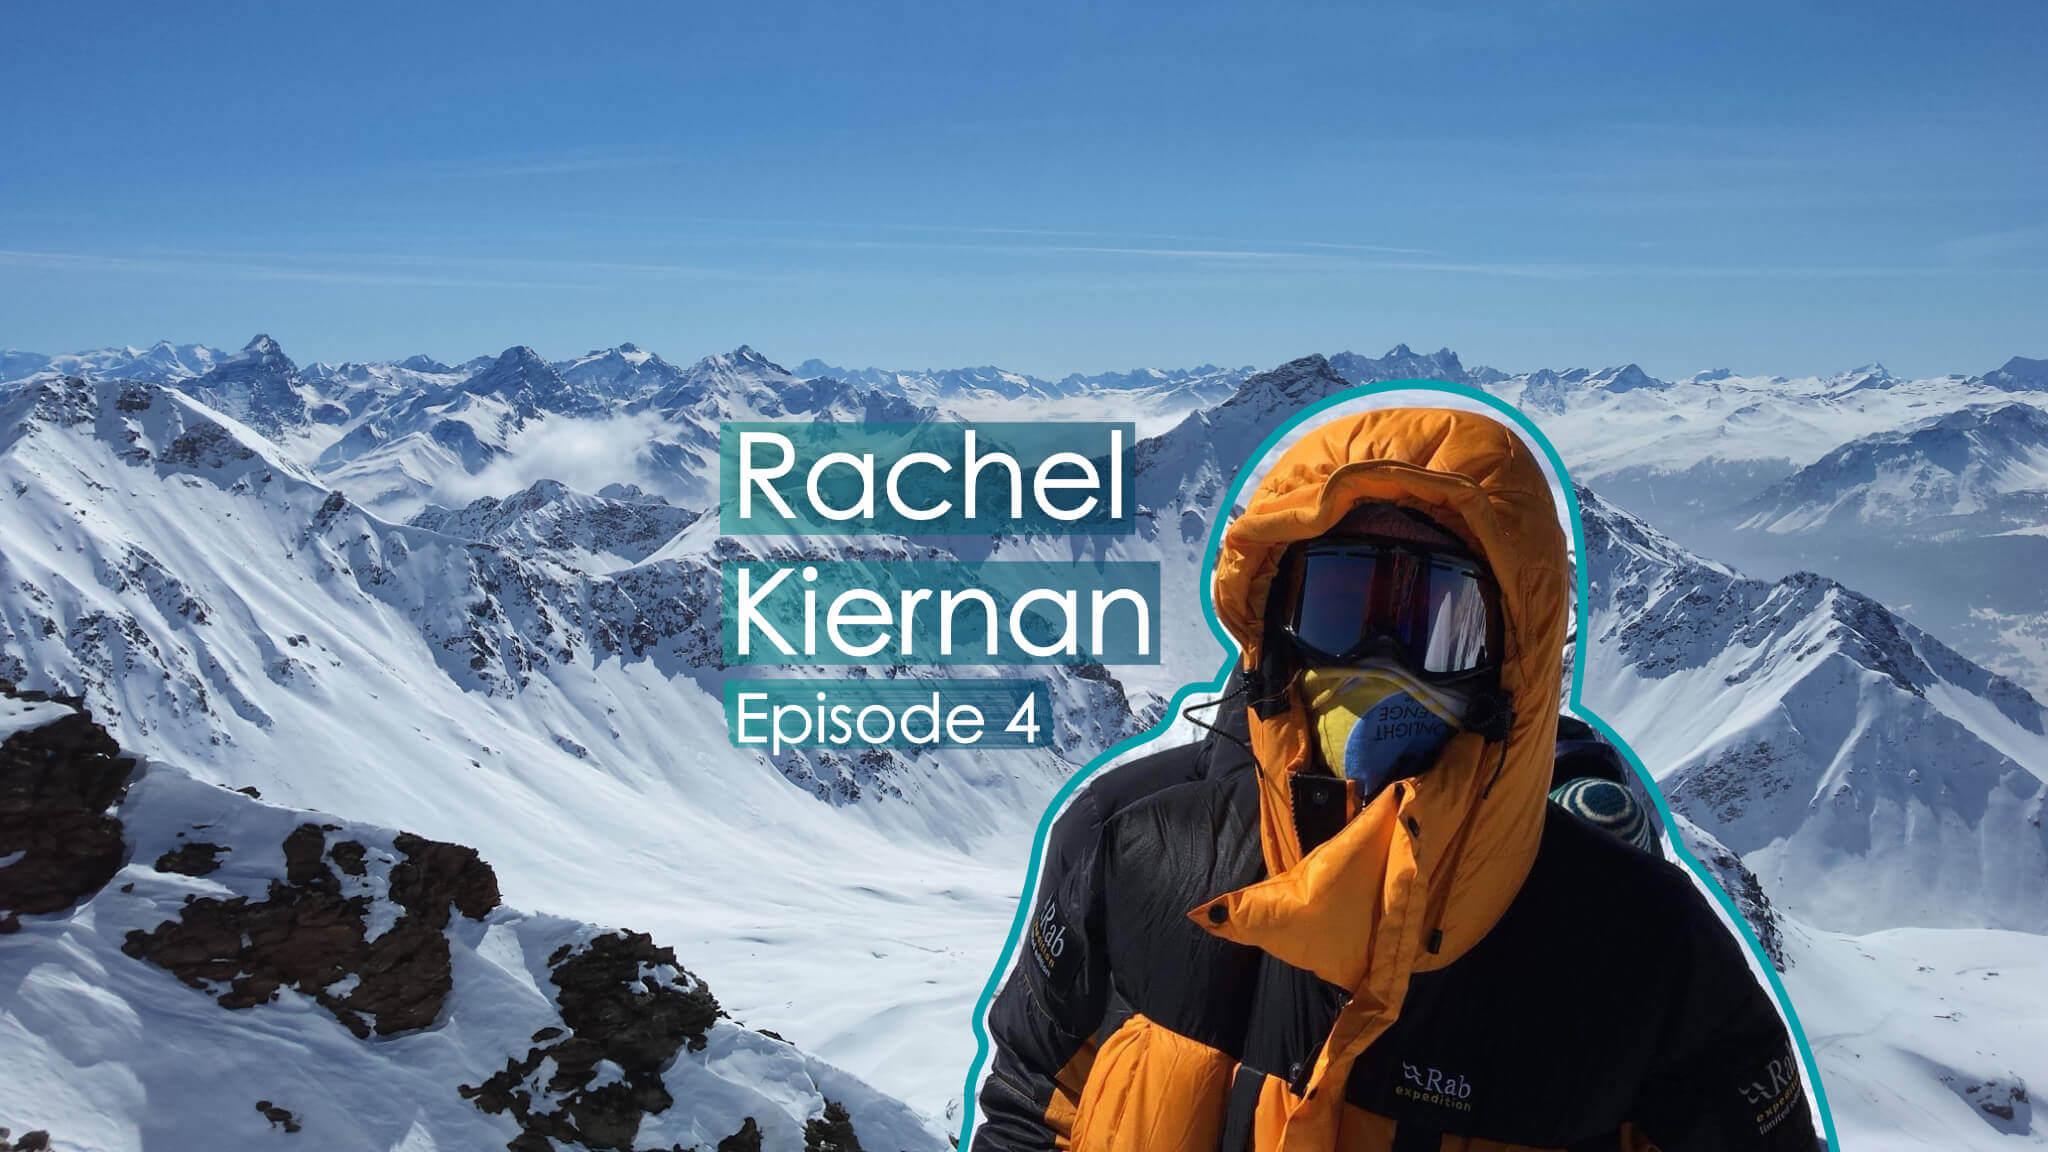 Earth's Edge Podcast Rachel Kiernan